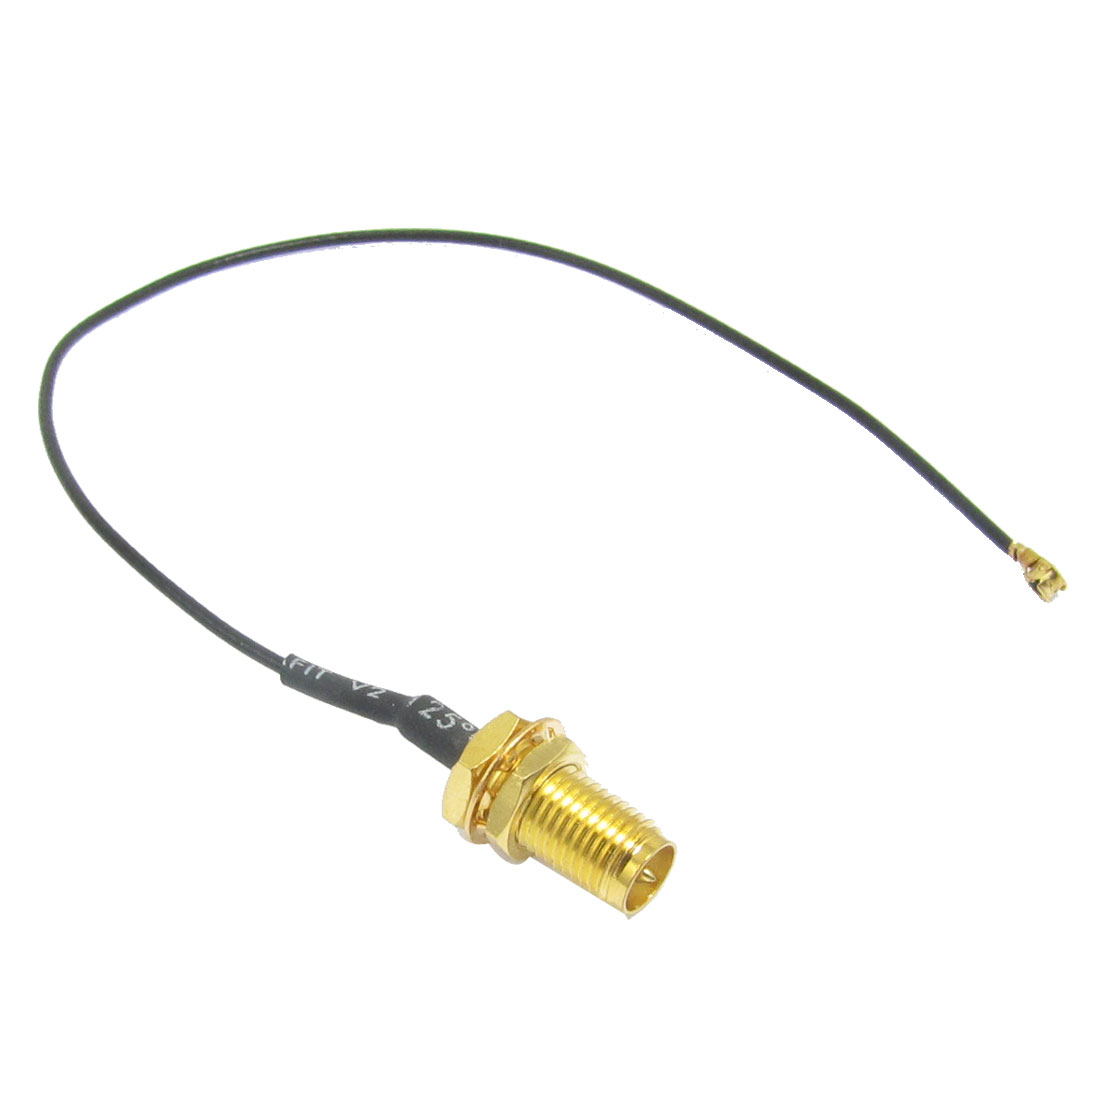 U.fl IPX to RP SMA Female Antenna for Wifi Network 19cm